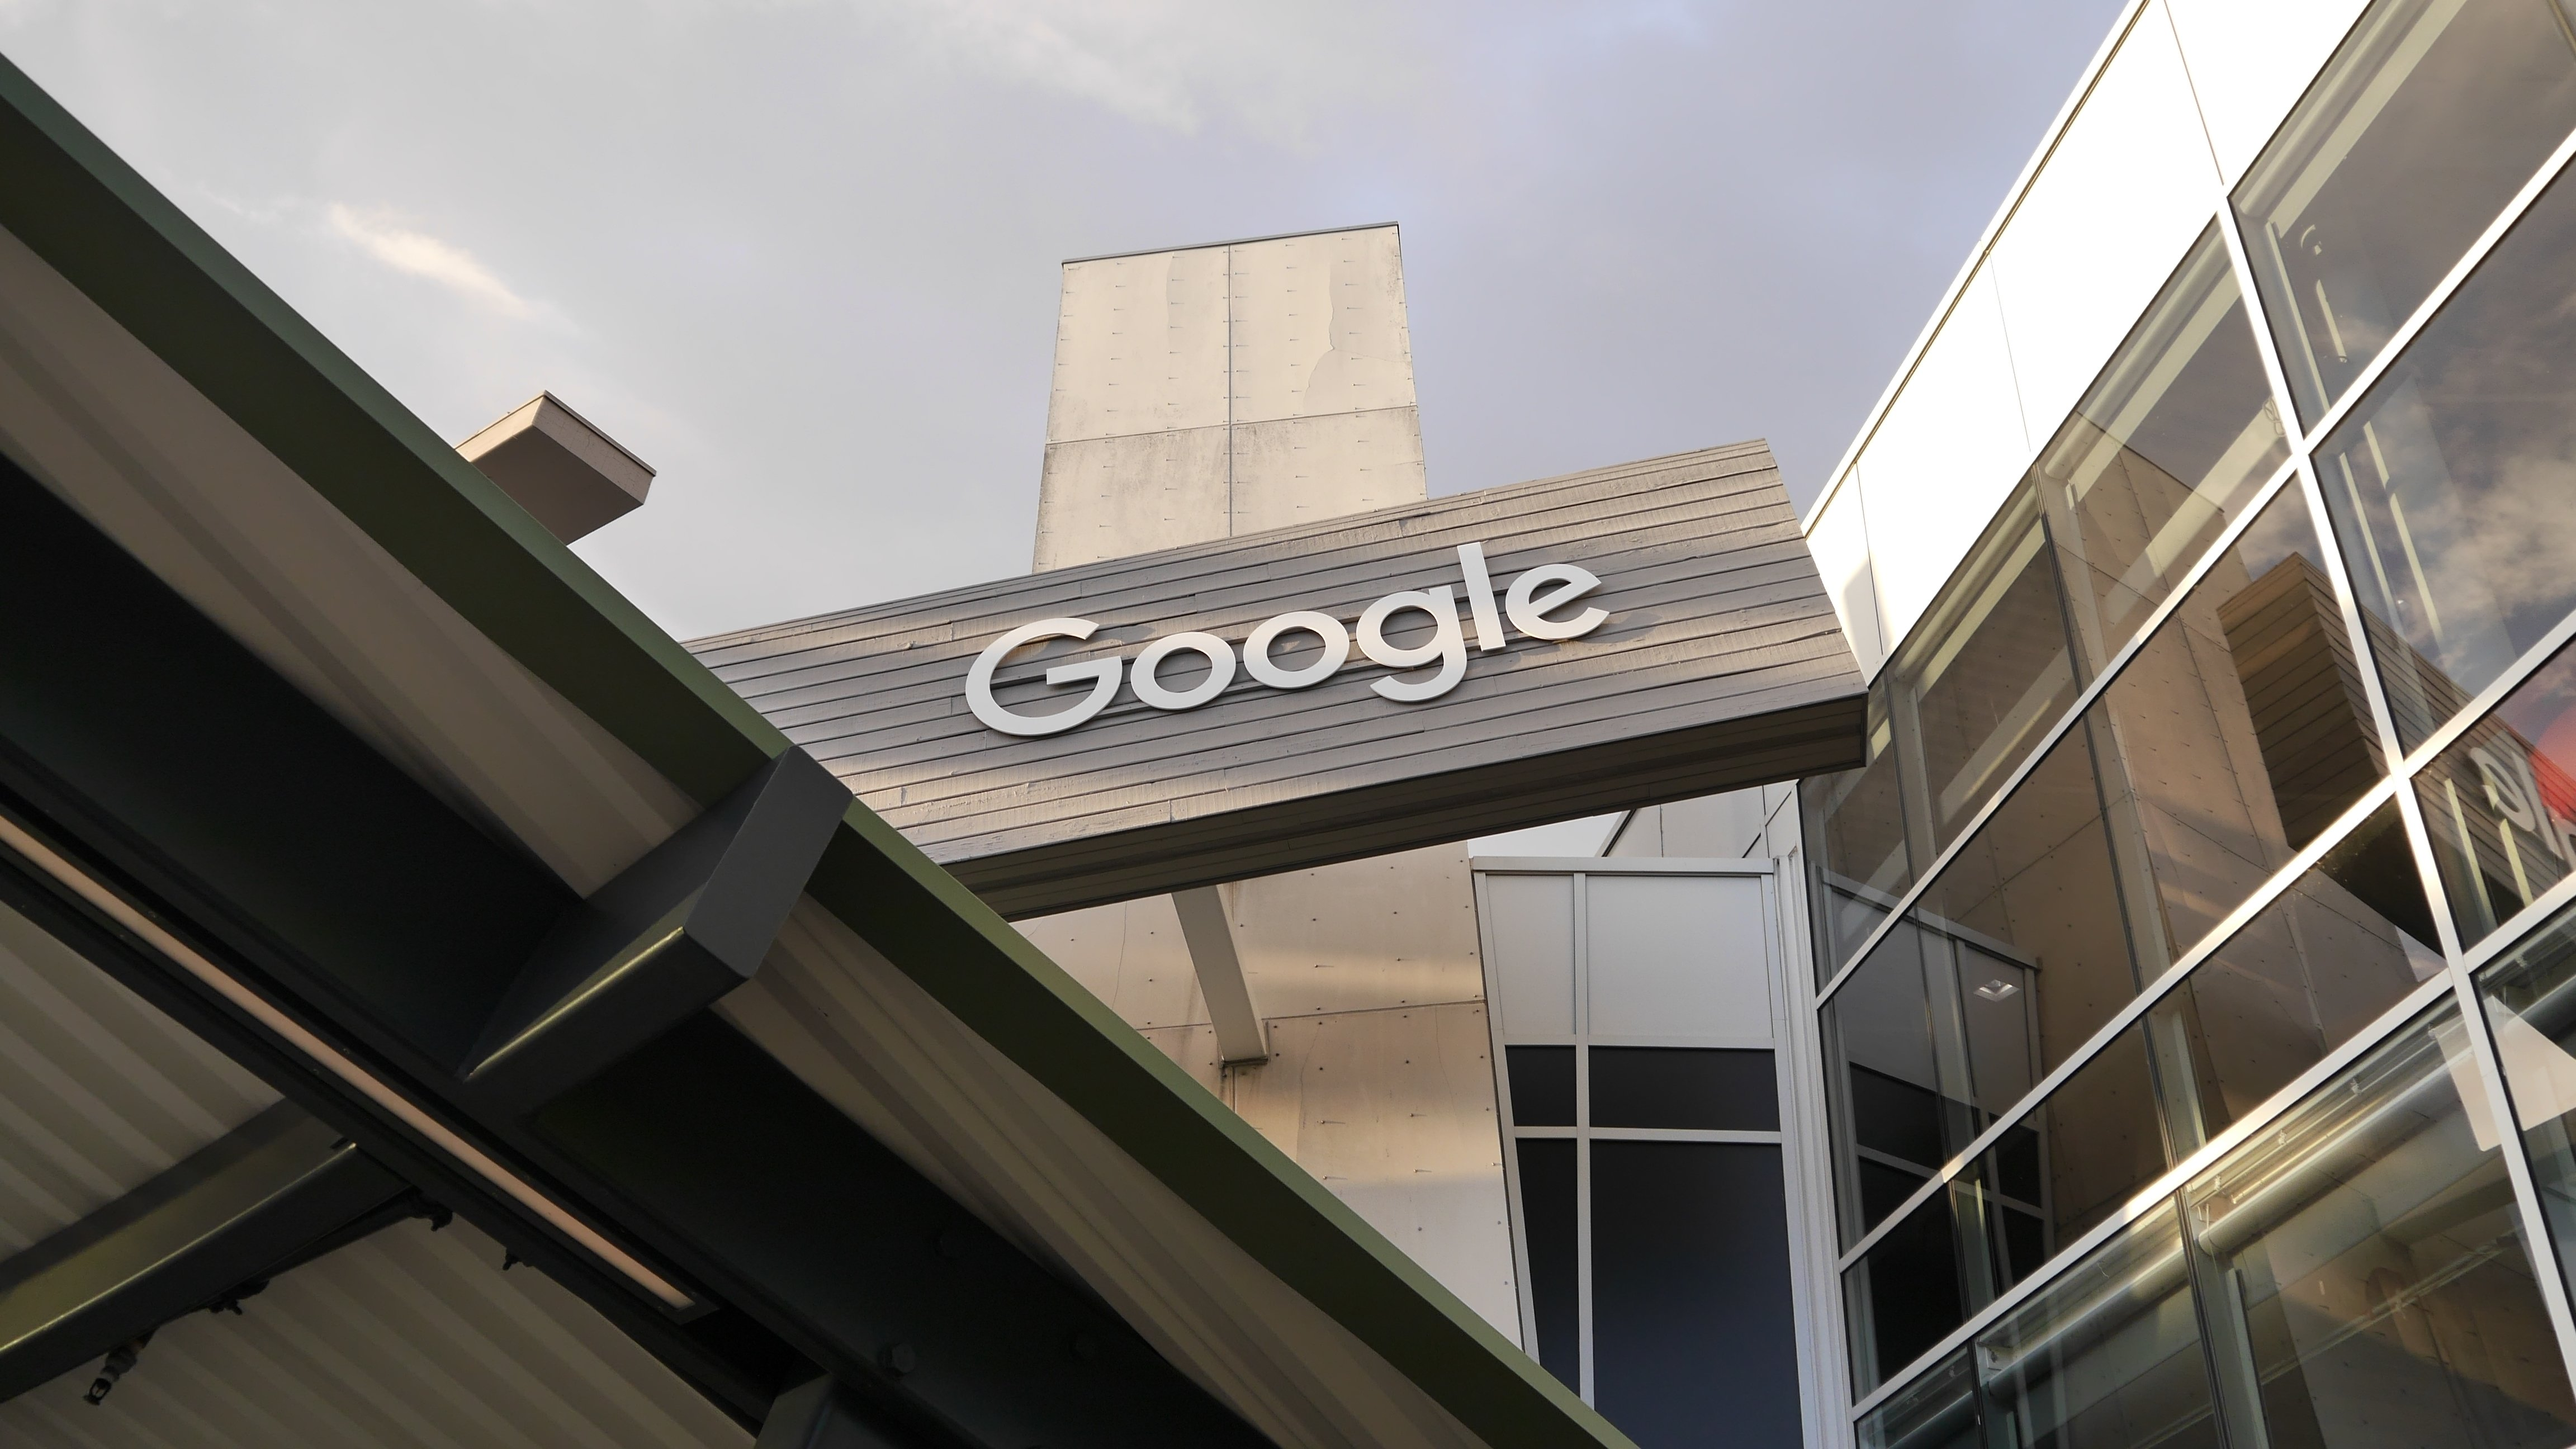 Google Cloud continues to grow, is coming to Saudi Arabia - DCD